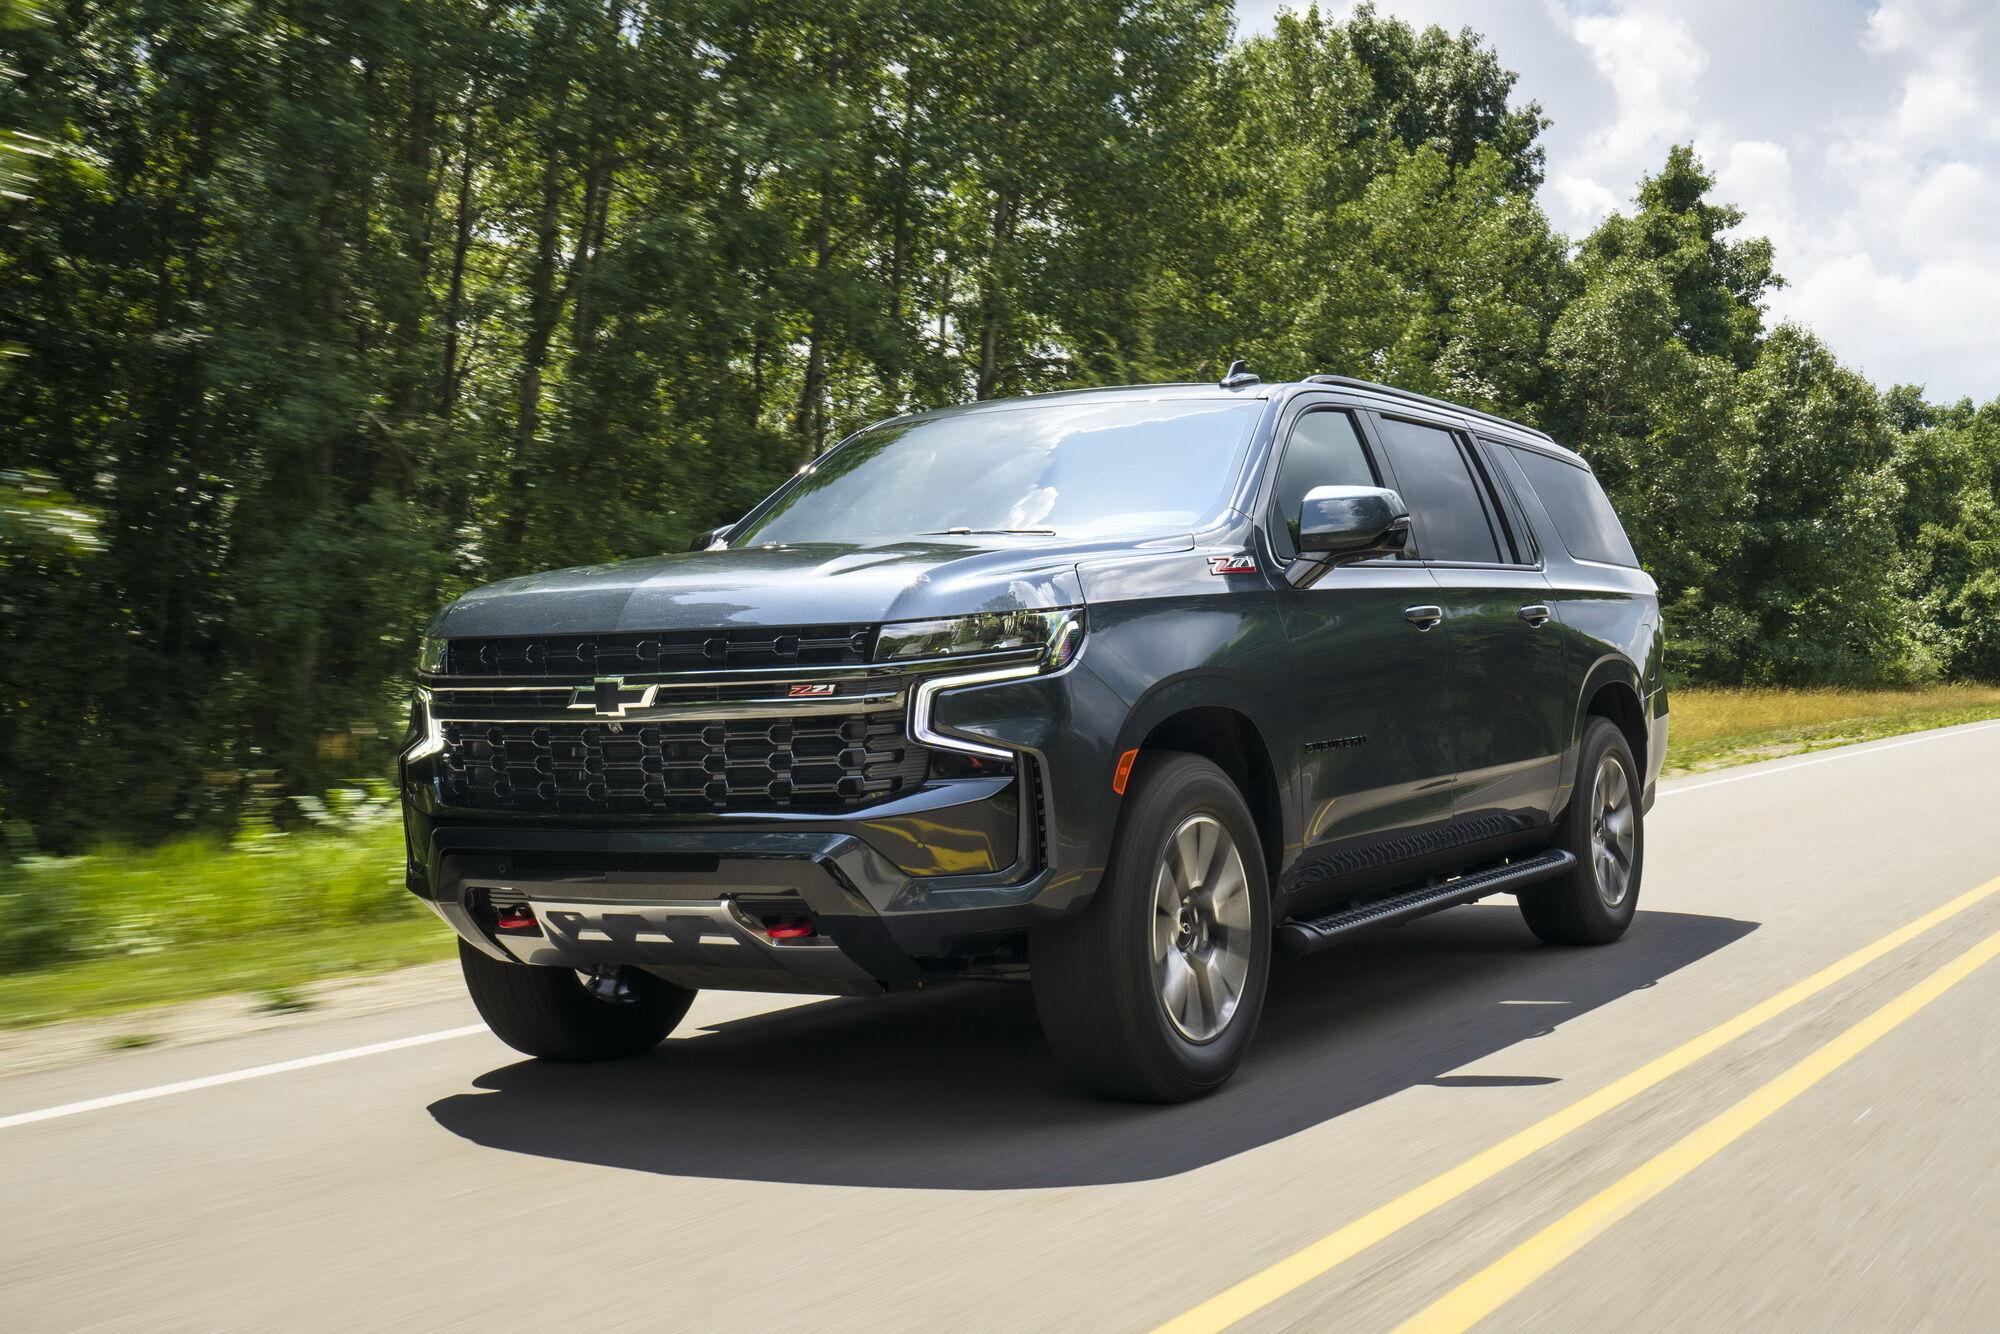 Chevrolet Suburban последнего поколения